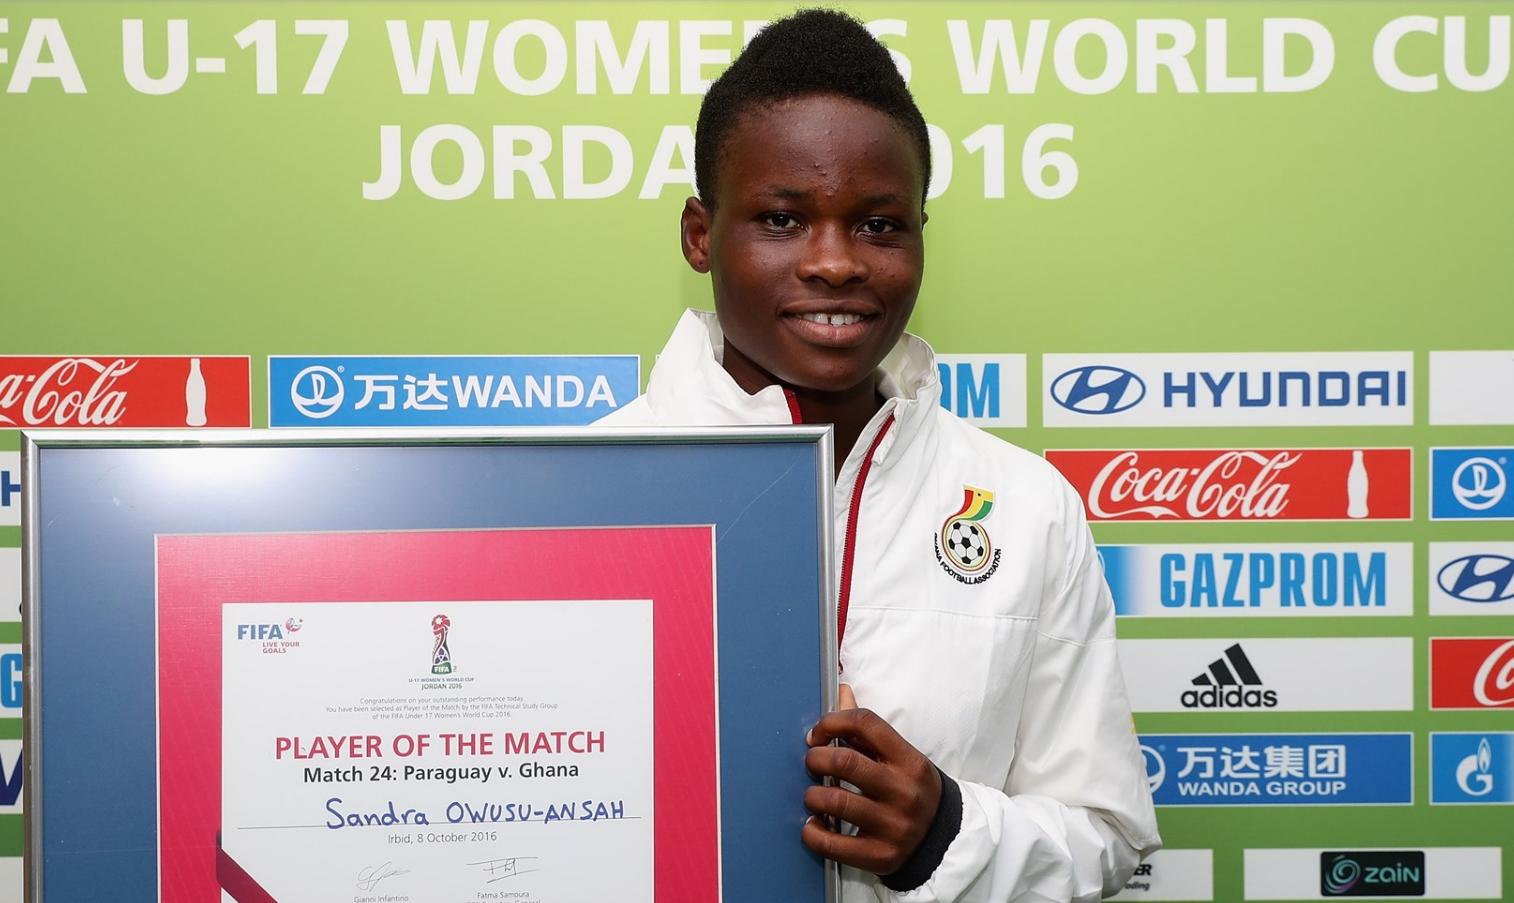 Captain fantastic Sandra Owusu-Ansah wins Player of the Match award